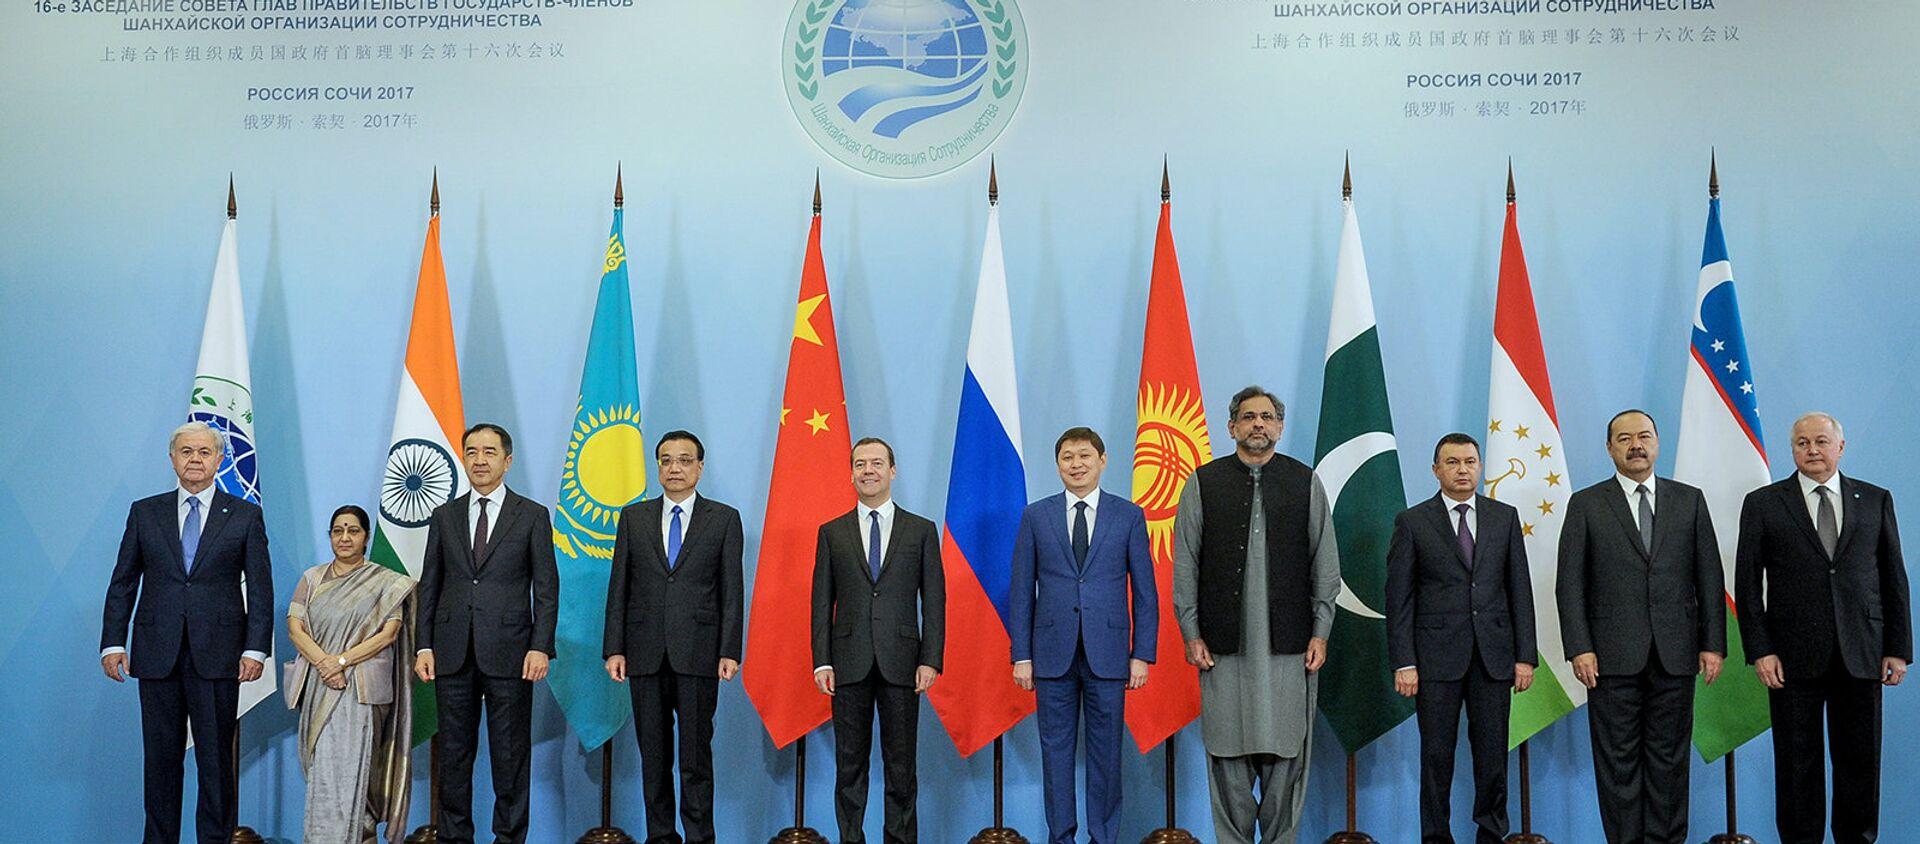 Заседание Совета глав ШОС - Sputnik Узбекистан, 1920, 20.12.2017